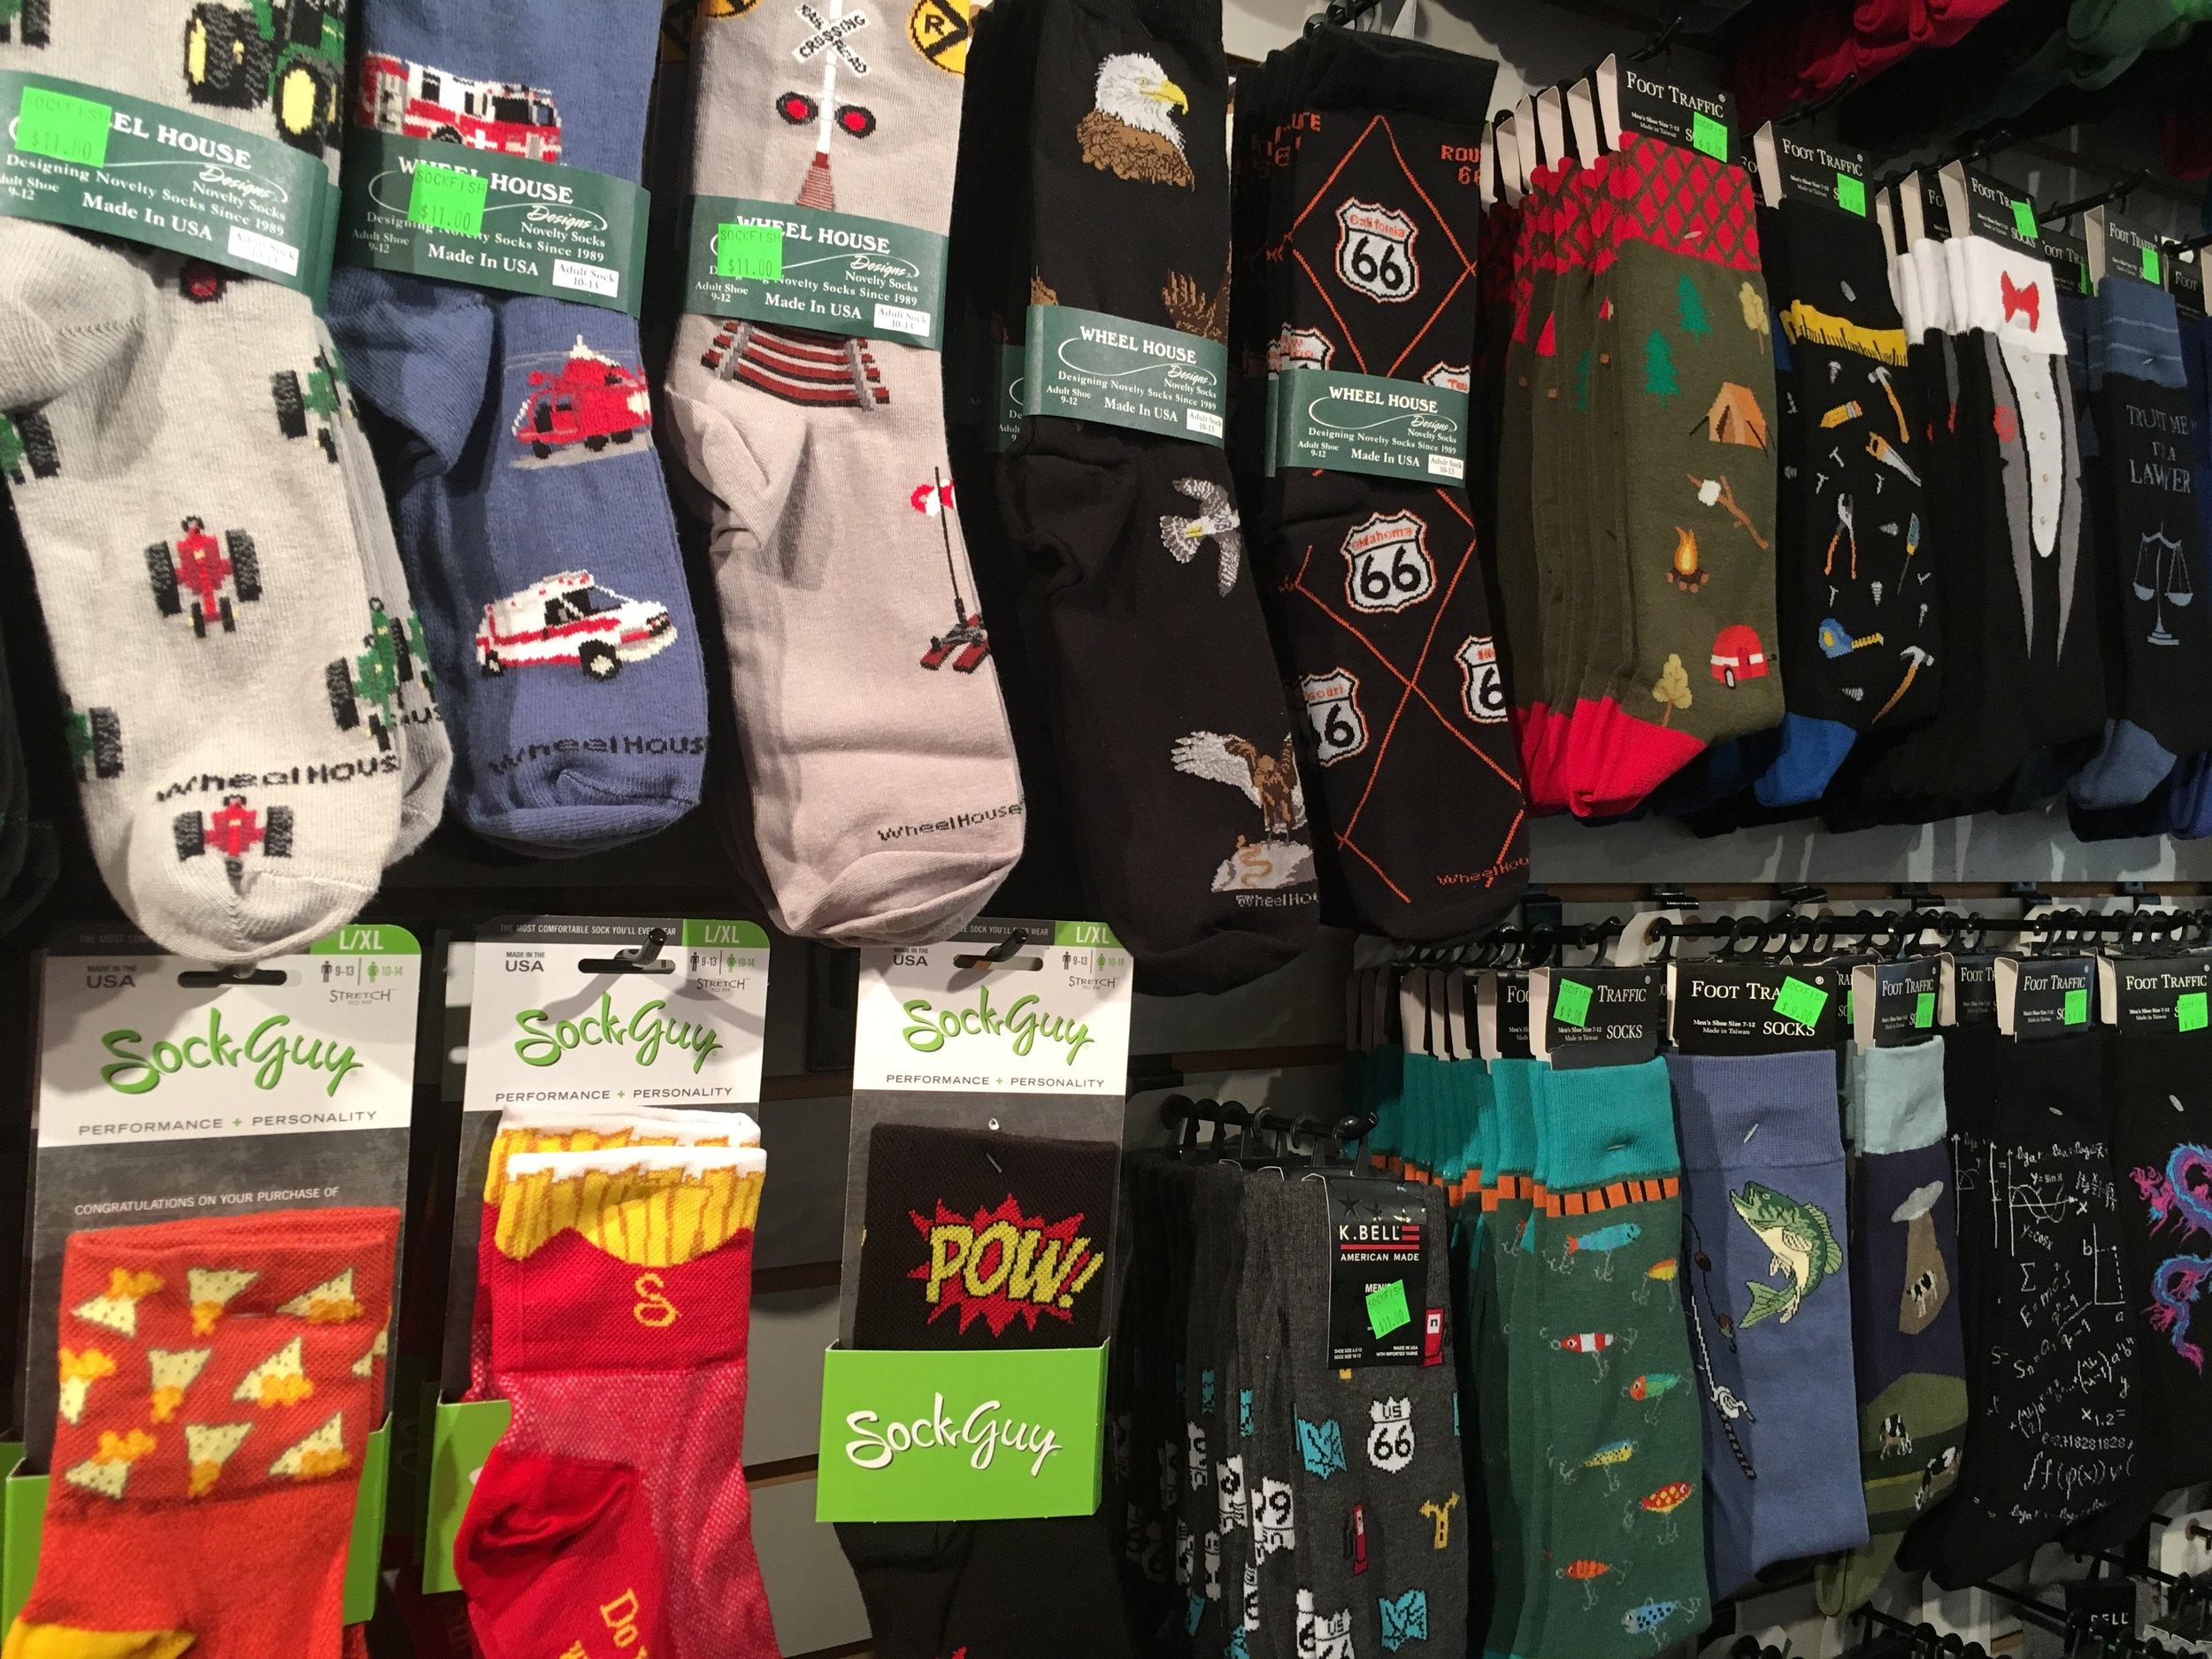 Walls of socks